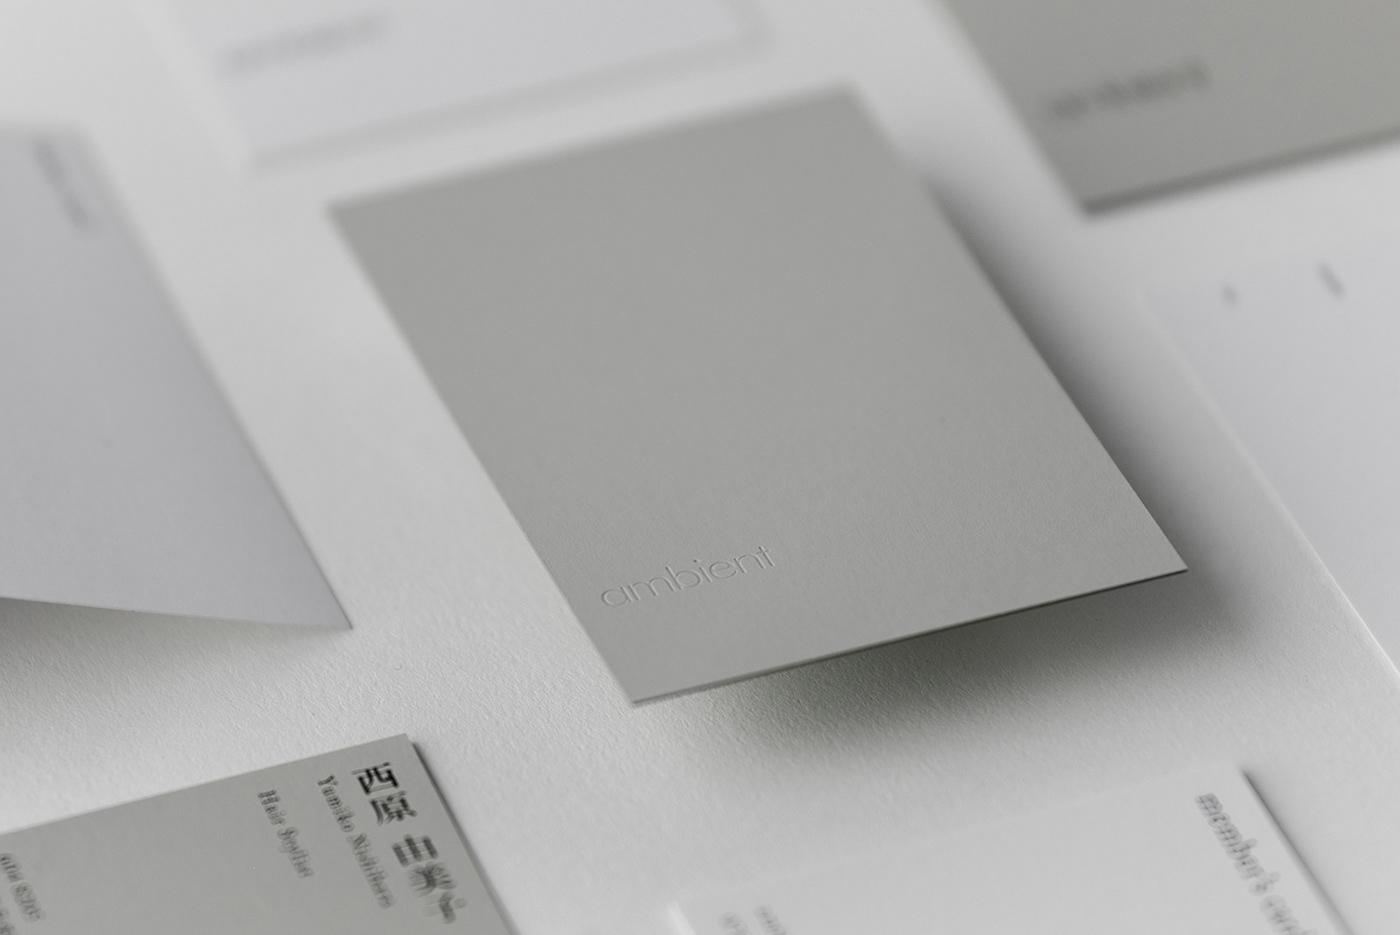 beauty salon Branding Identity Econosys Design japan kyoto Web Design  ウェブデザイン ブランディング 京都 美容室